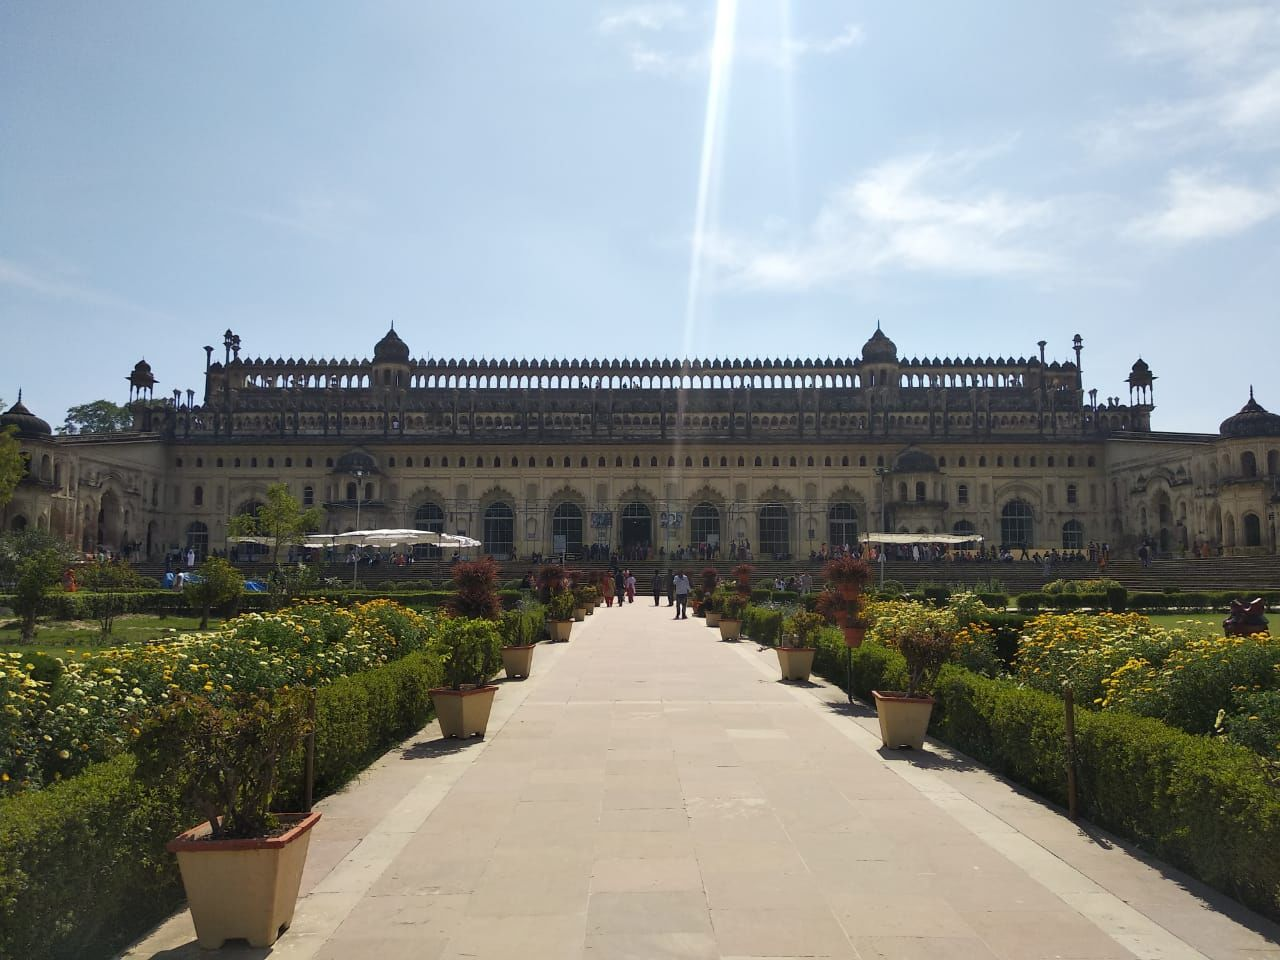 Photo of Bada Imambara (Main Building) By Deepanshi